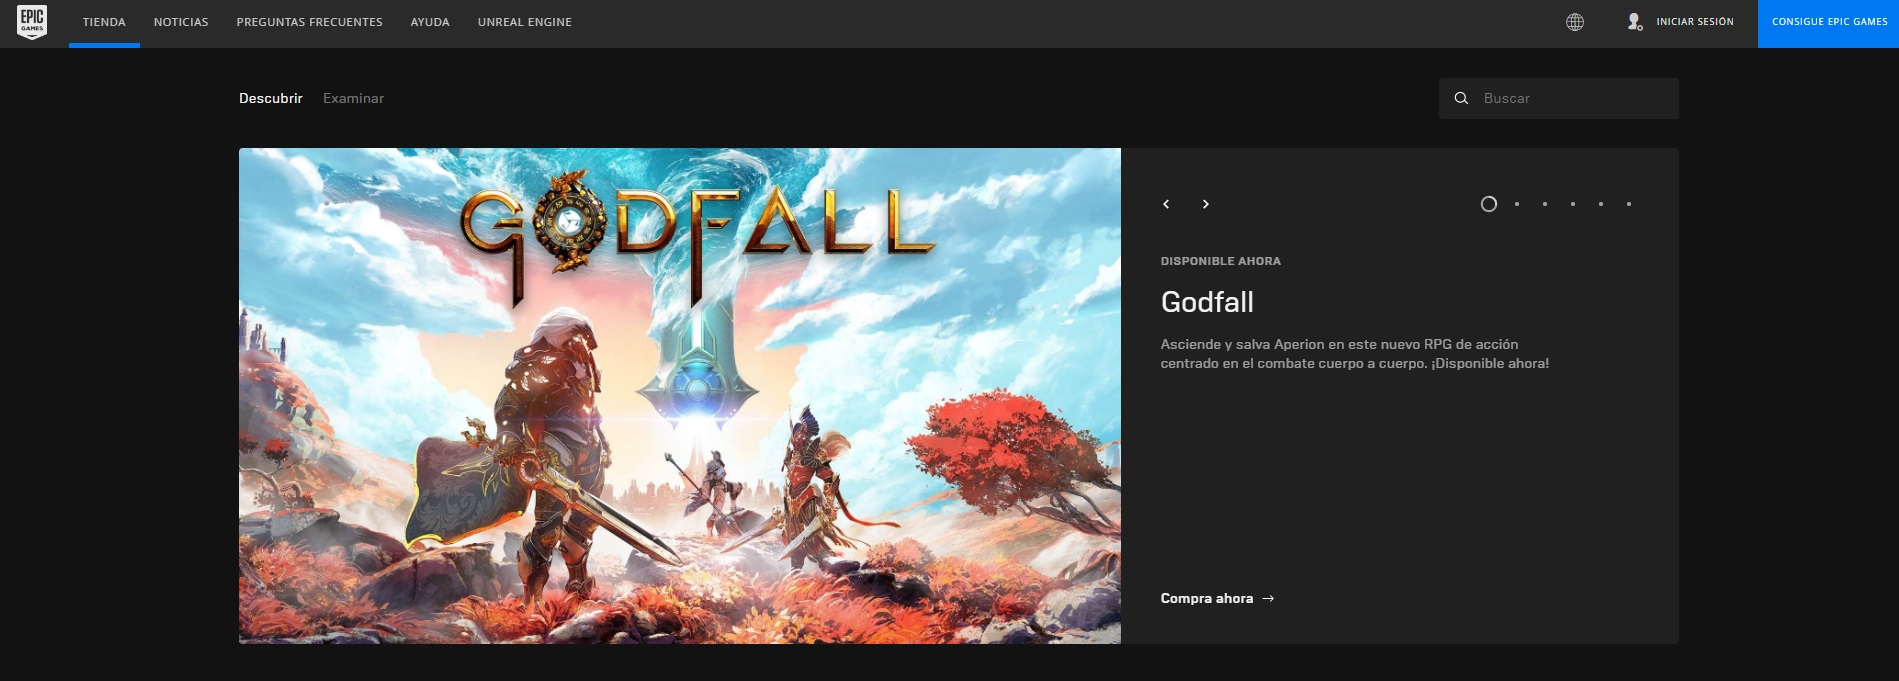 Página oficial de Epic Games Store